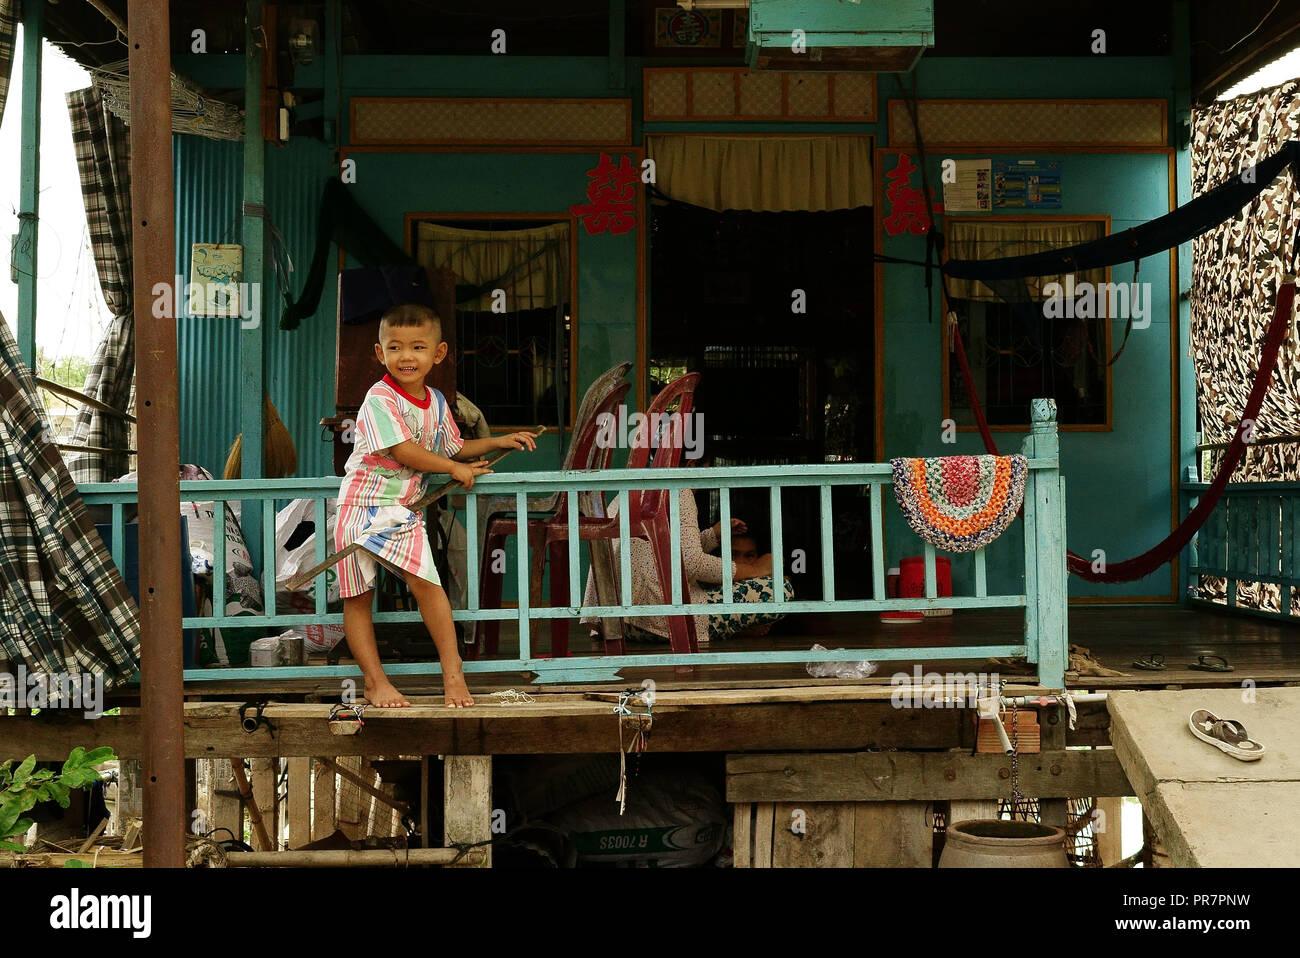 SEX AGENCY Chau Doc